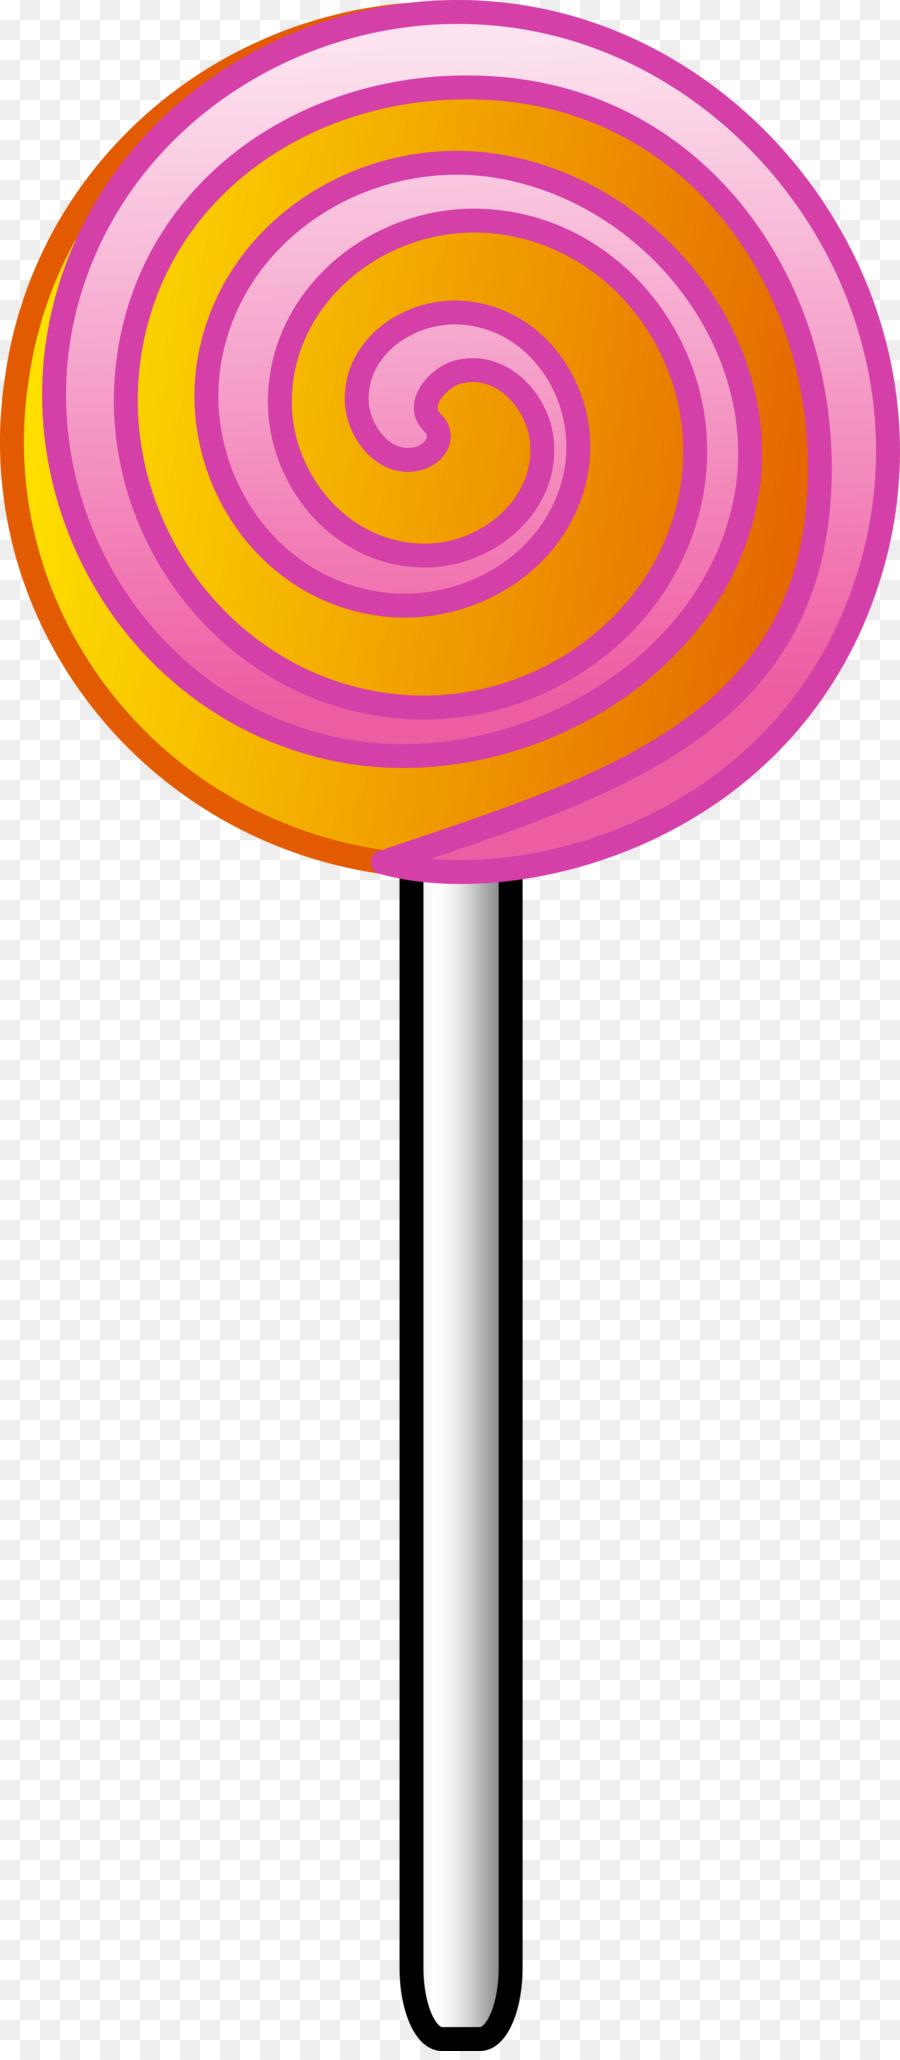 Cartoon candy . Lollipop clipart circle